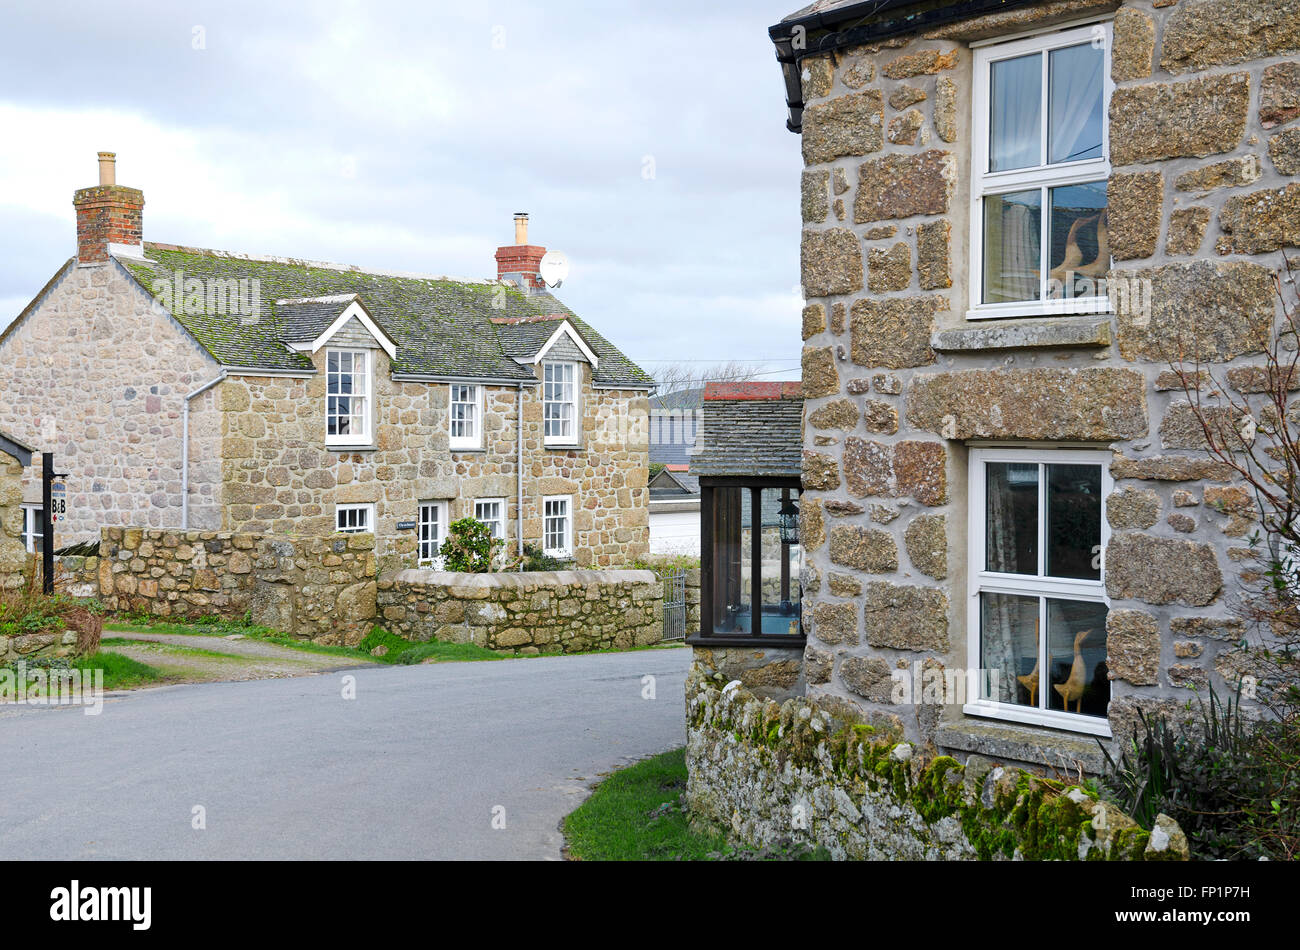 The hamlet of Treen near Porthcurno in Cornwall, UK Stock Photo